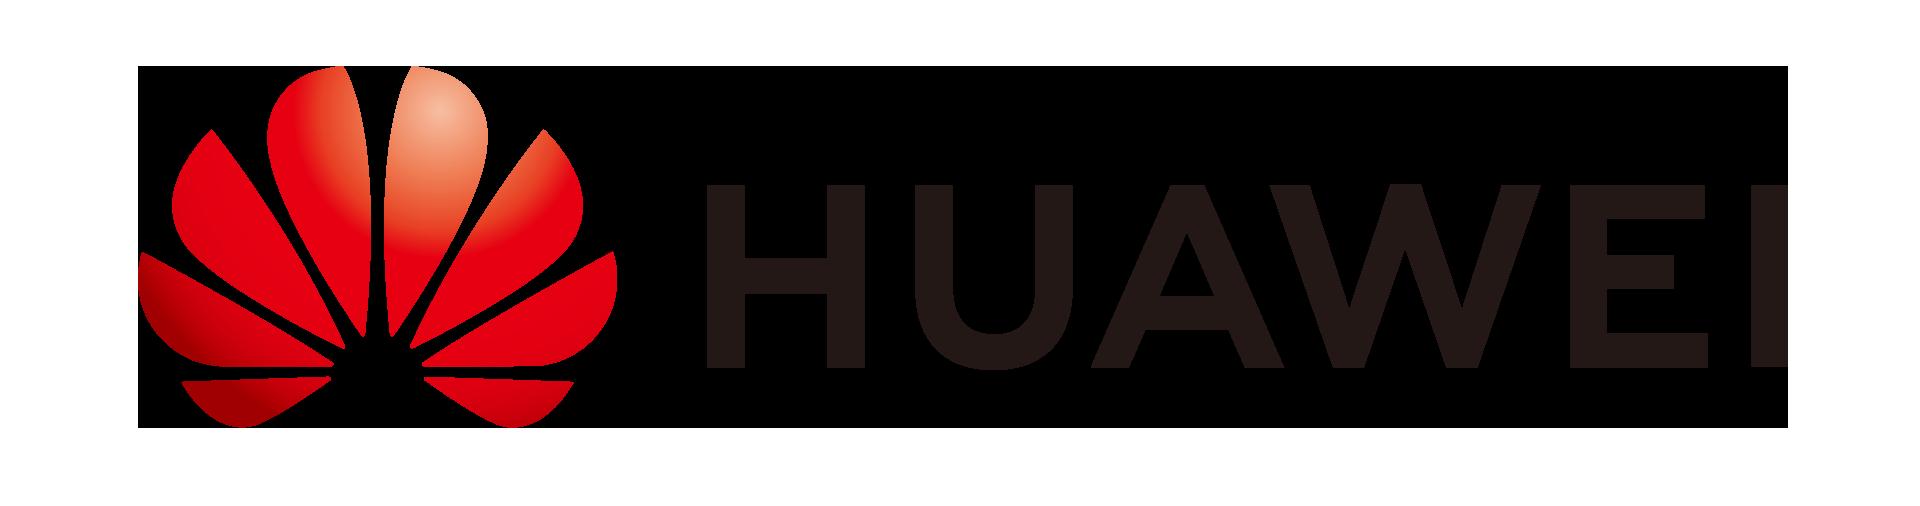 Huawei Smartdesign